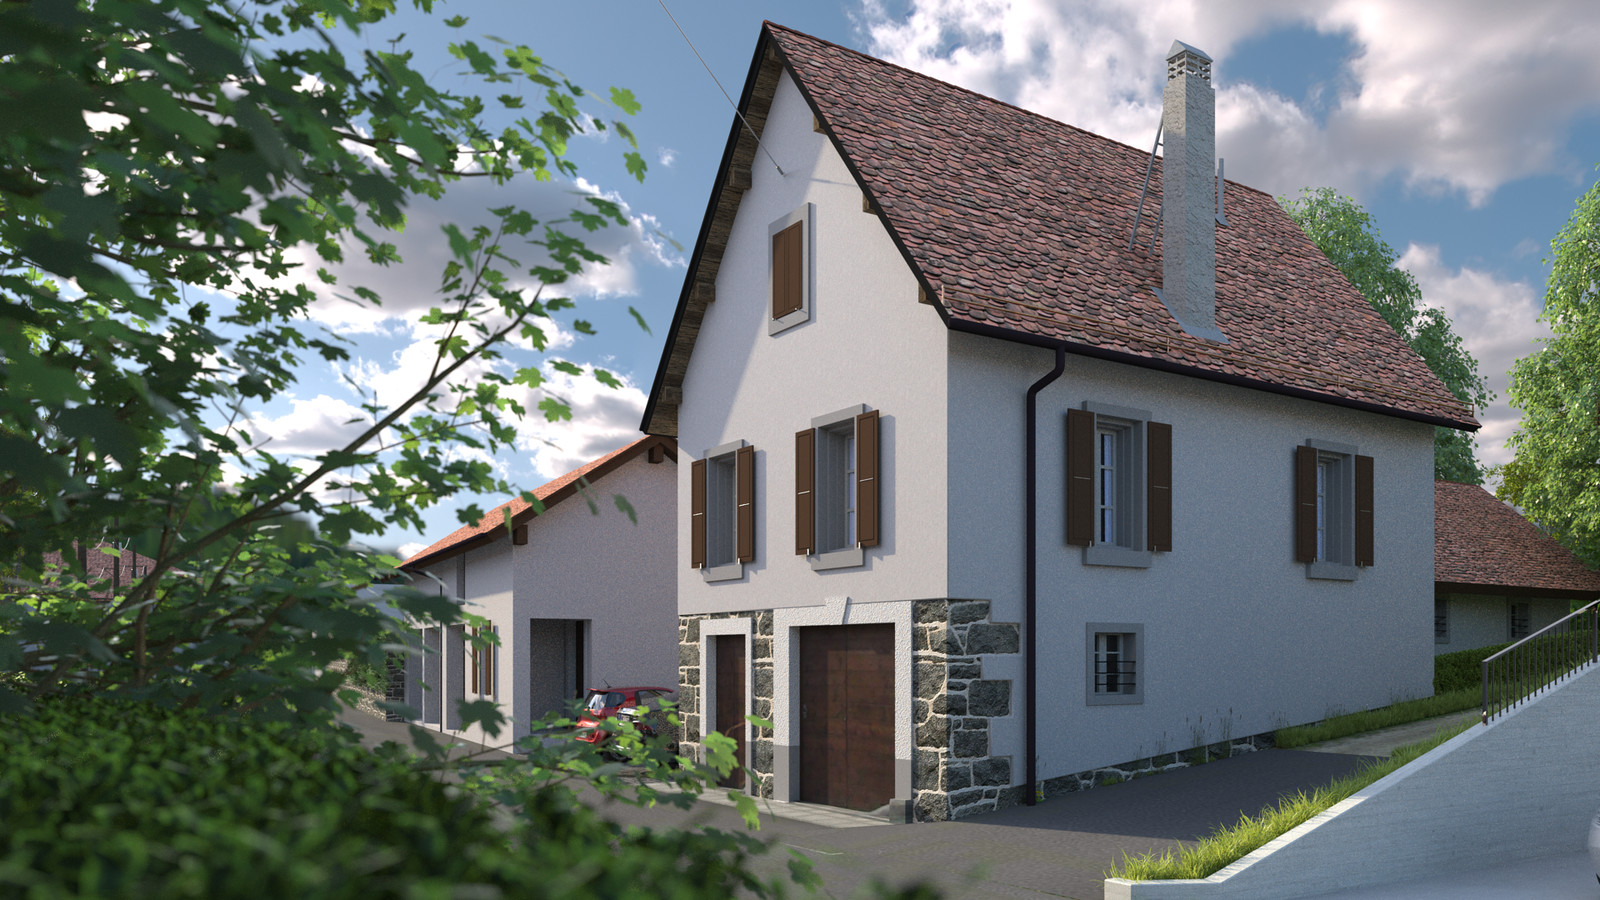 SketchUp + Thea Render  Little Swiss House Scene 28 162-hdri-skies 01 b HD 1920 x 1080 Presto MC  HDR by HDRI-SKIES found here: http://hdri-skies.com/shop/hdri-sky-162/